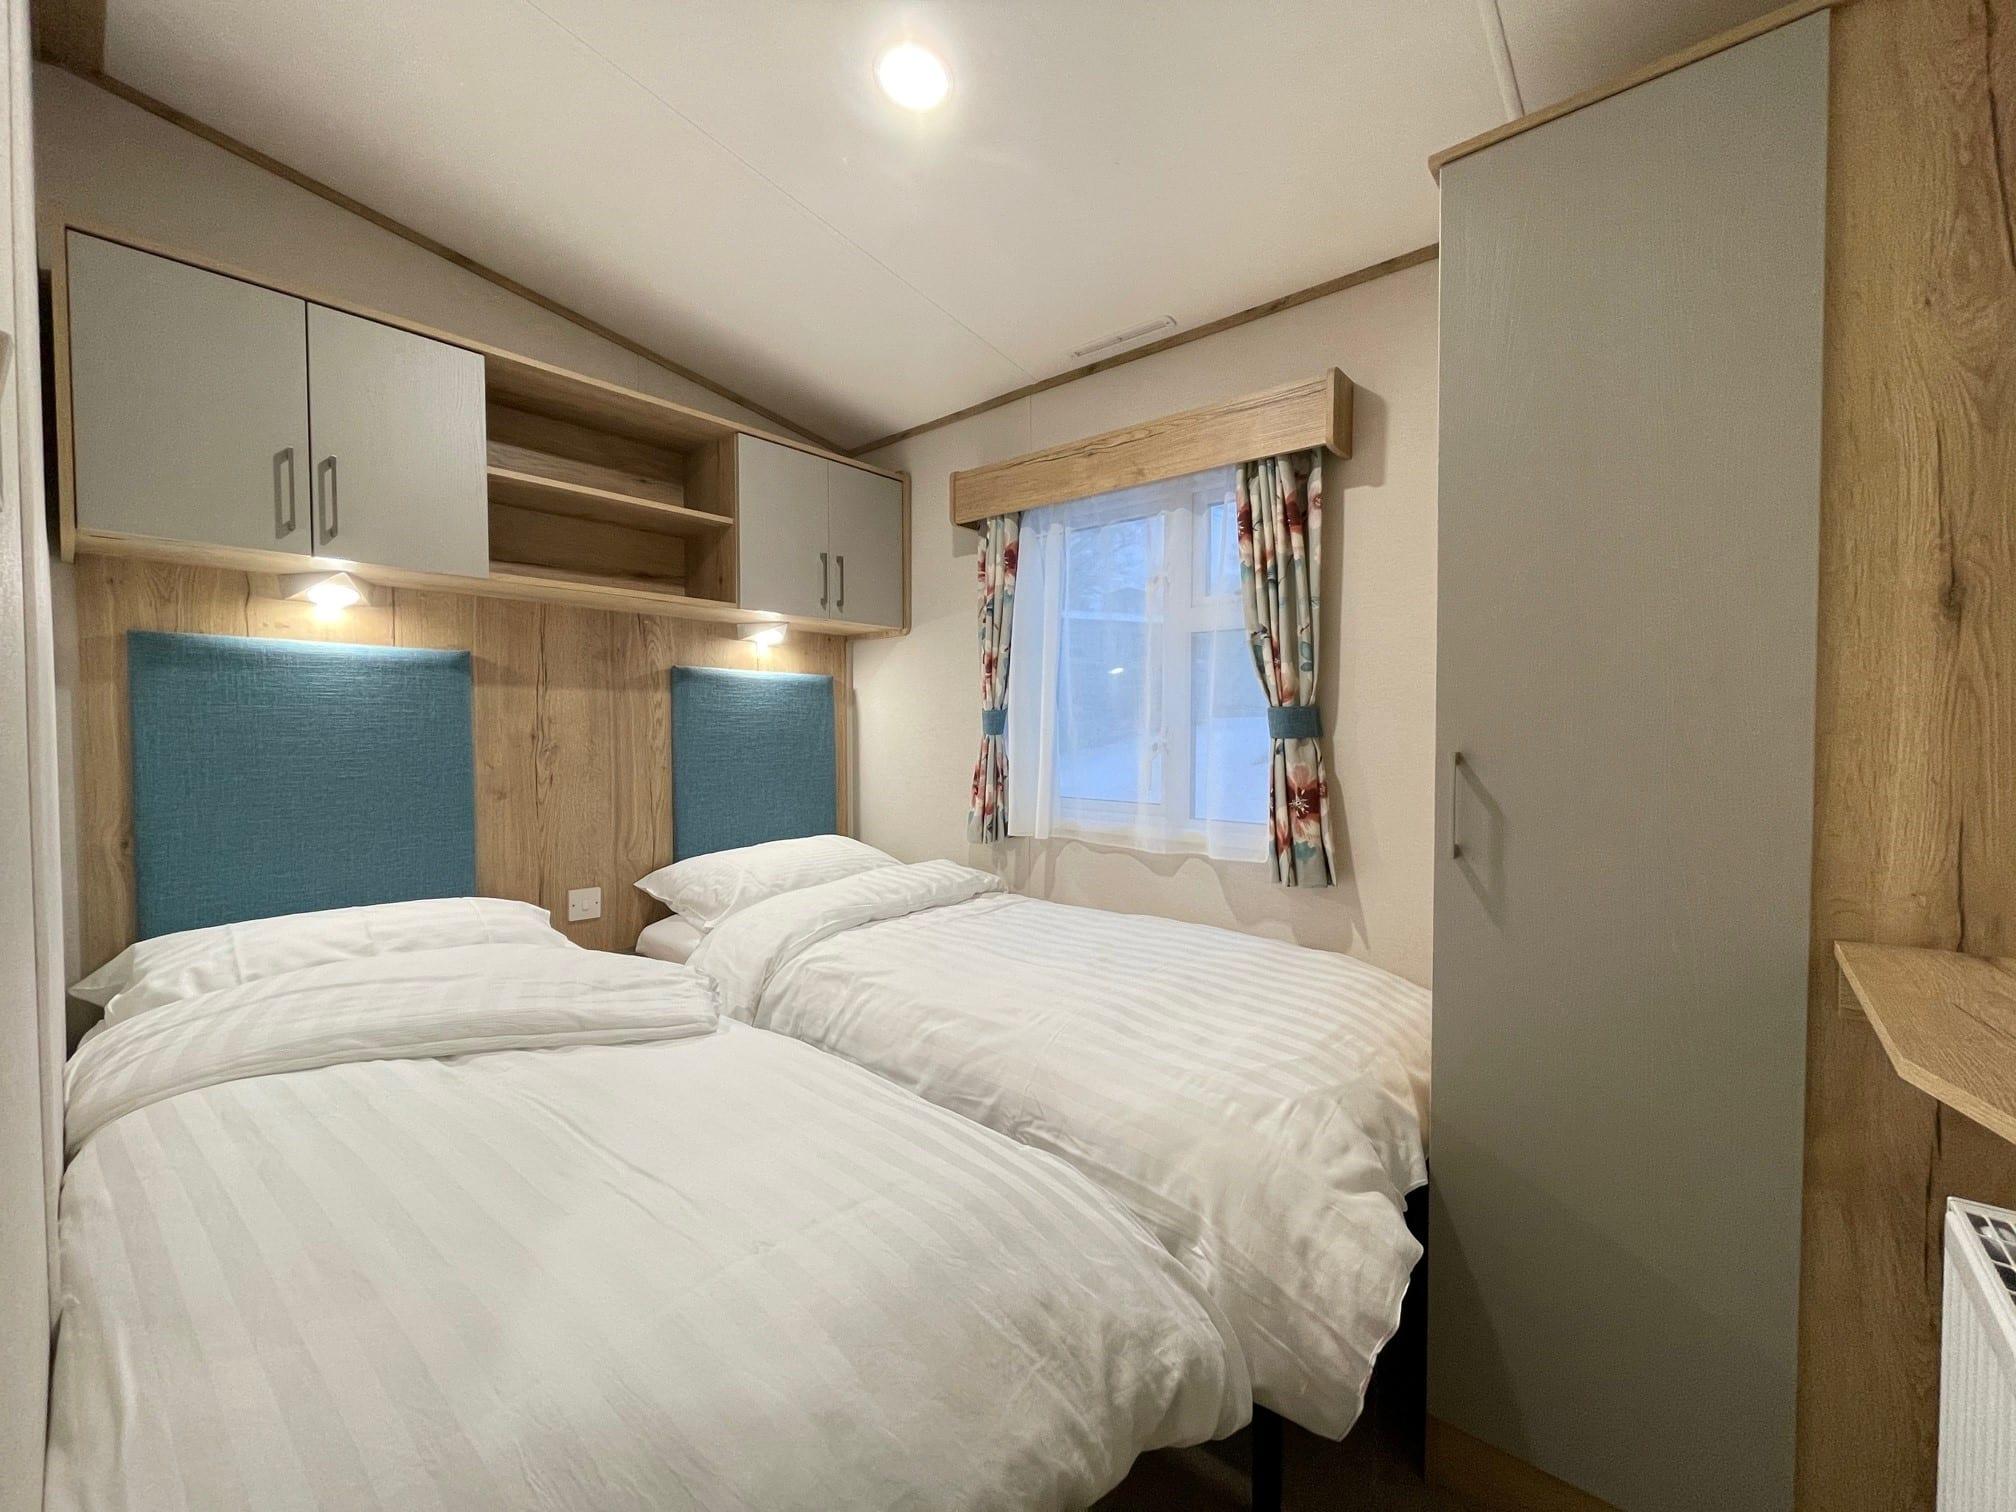 Holgates Holiday parks - Twin bedroom in caravan